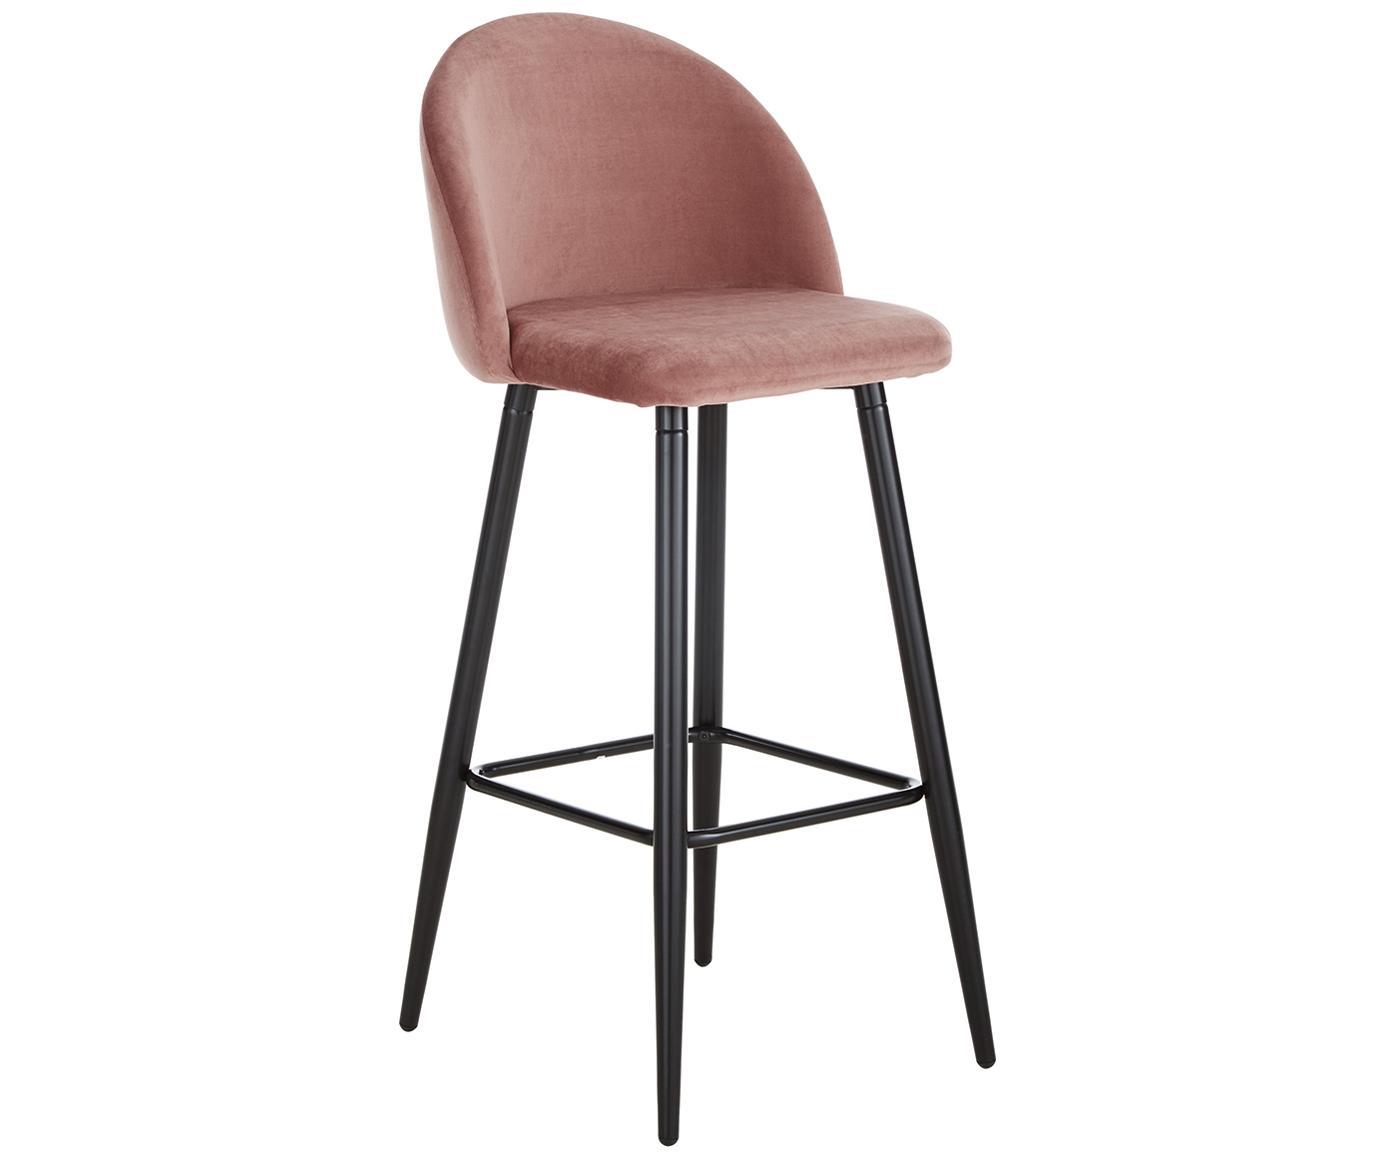 Roze fluwelen barstoel Amy, Bekleding: fluweel (polyester), Poten: gepoedercoat metaal, Bekleding: roze. Poten: mat zwart, 45 x 103 cm